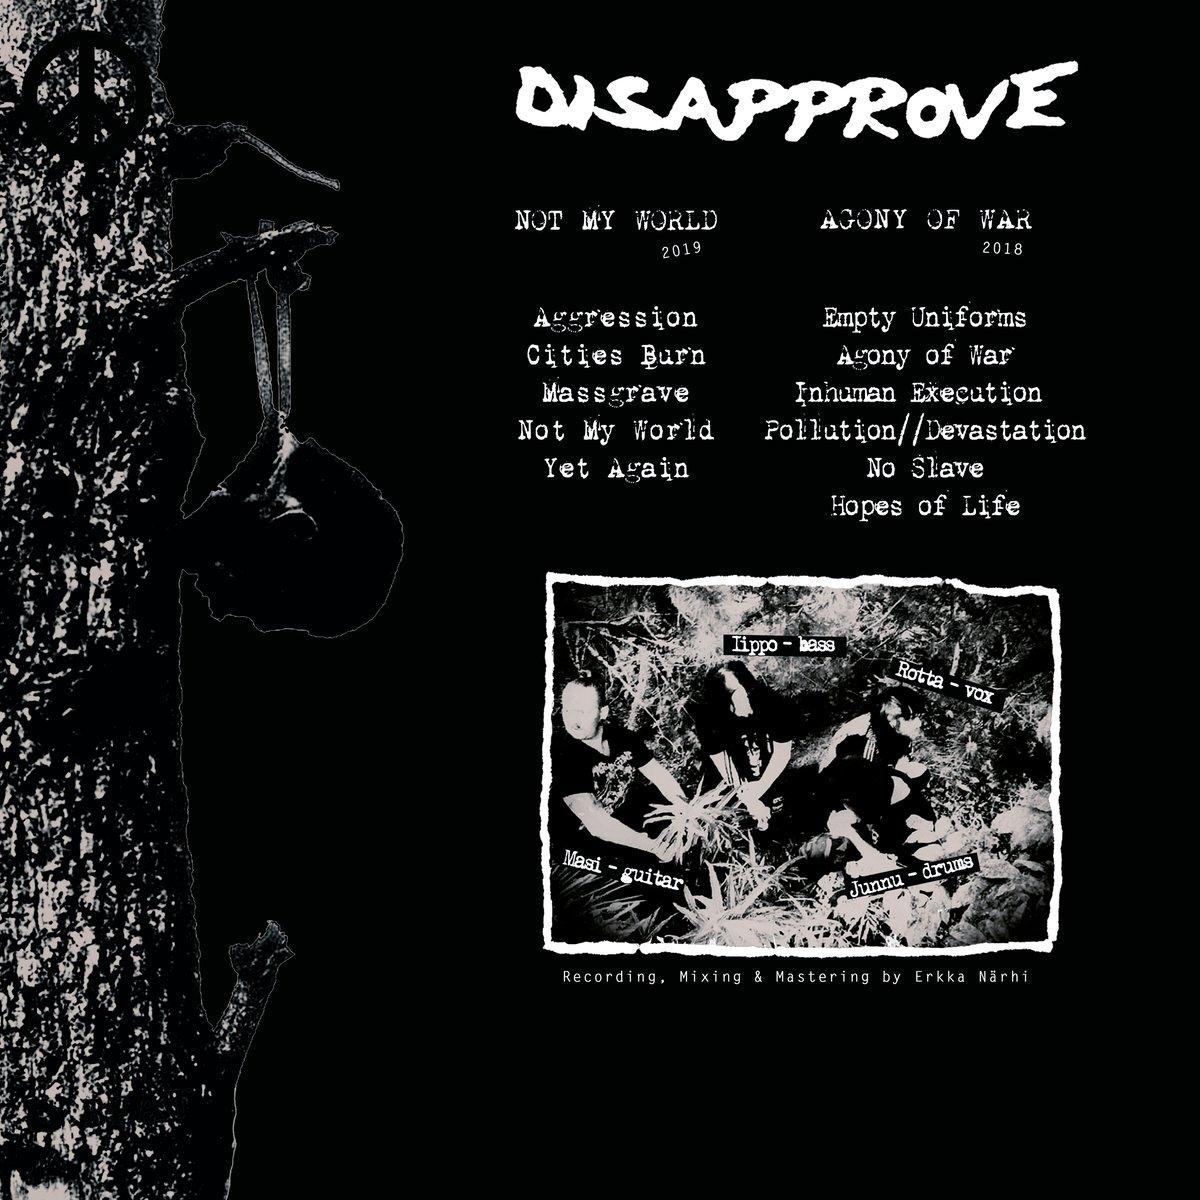 Image of Disapprove Devastation 12-inch black vinyl record